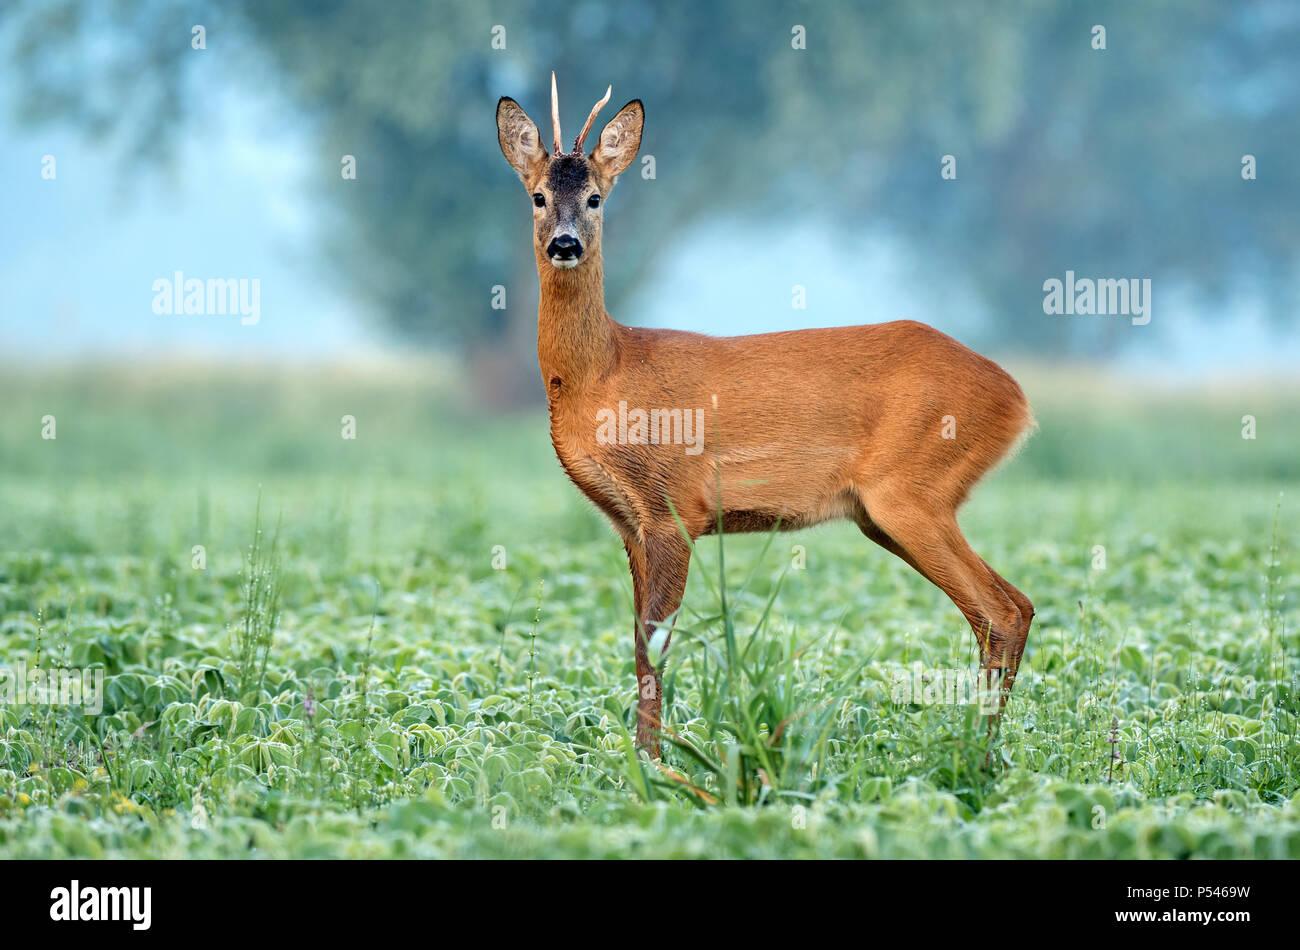 Wild roe buck standing in a soy field - Stock Image